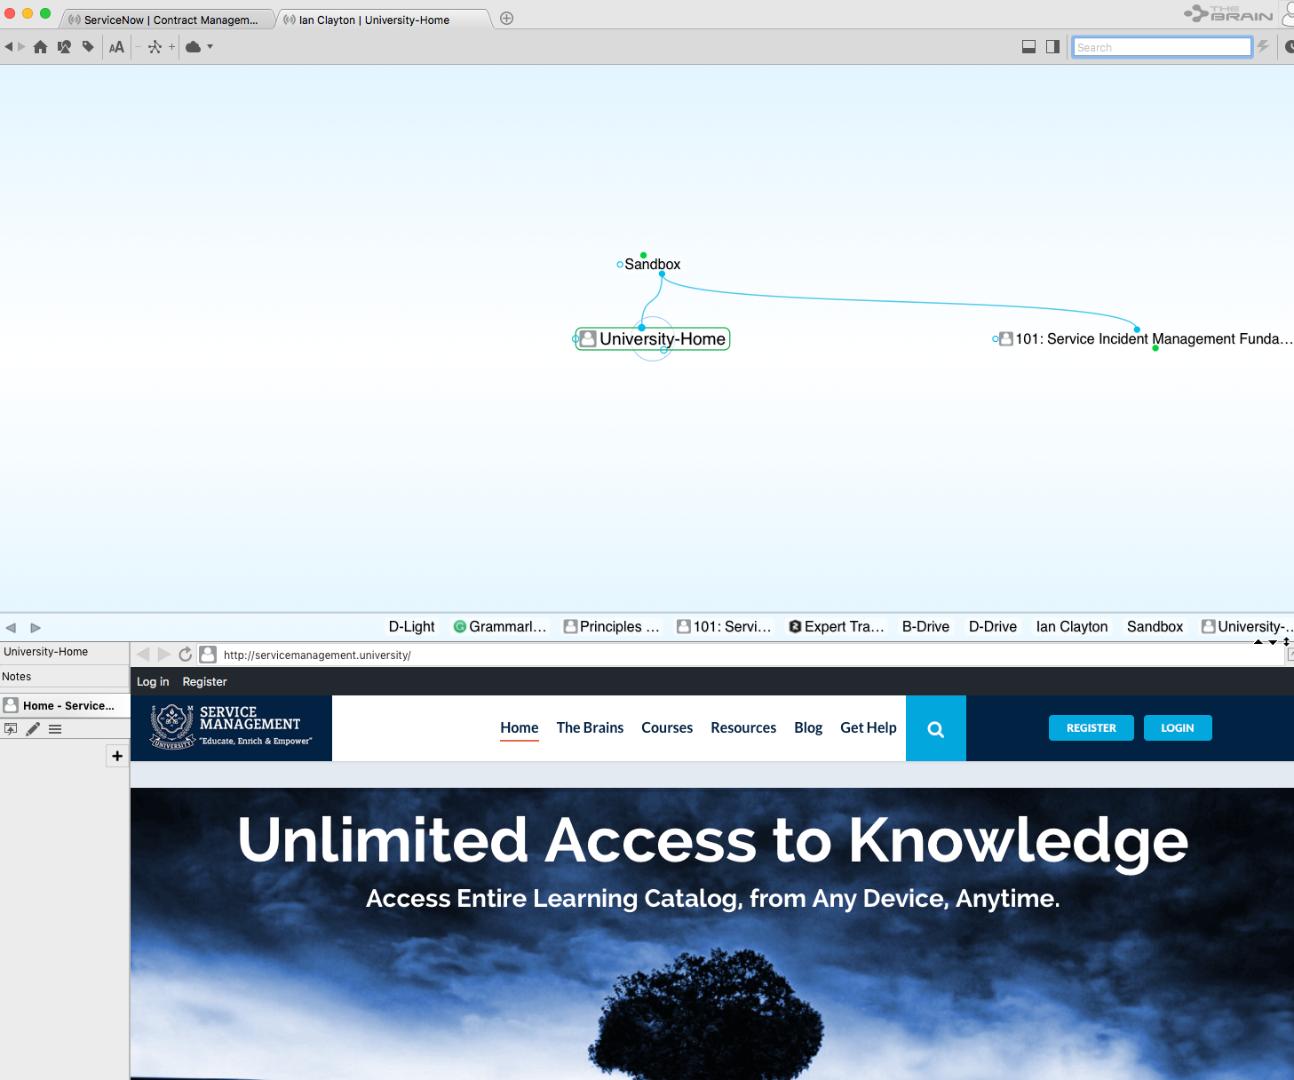 Click image for larger version - Name: Example-URL-via-Desktop-1.png, Views: 56, Size: 848.72 KB